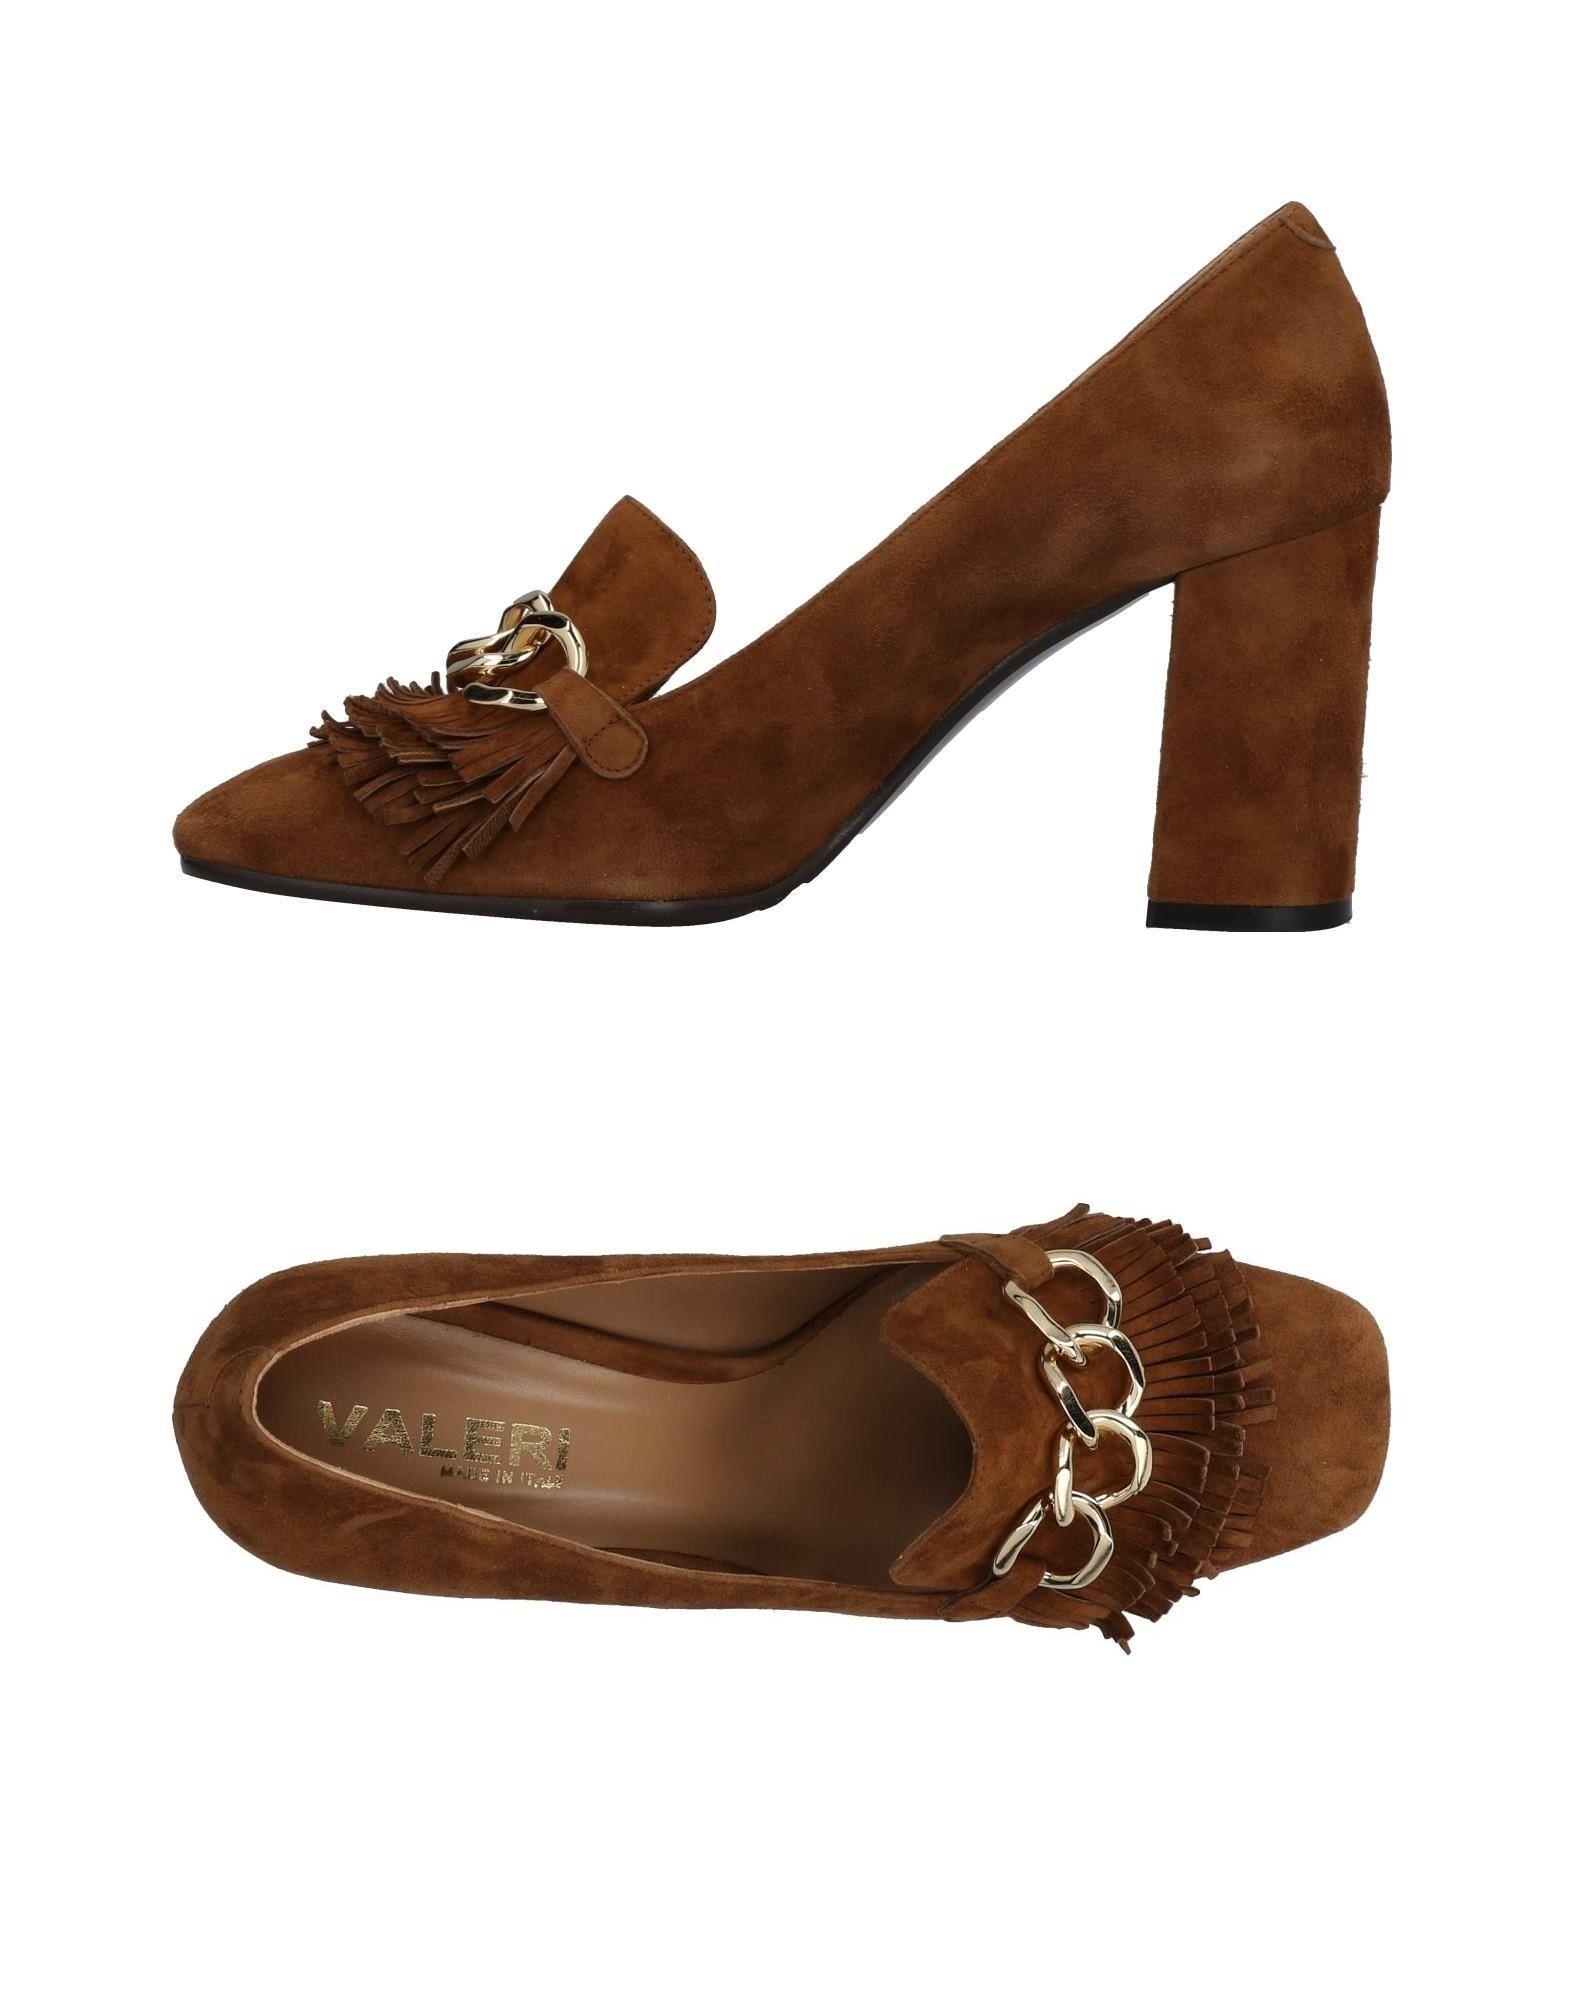 Valeri Mokassins Damen  11460014OJ Gute Qualität beliebte Schuhe